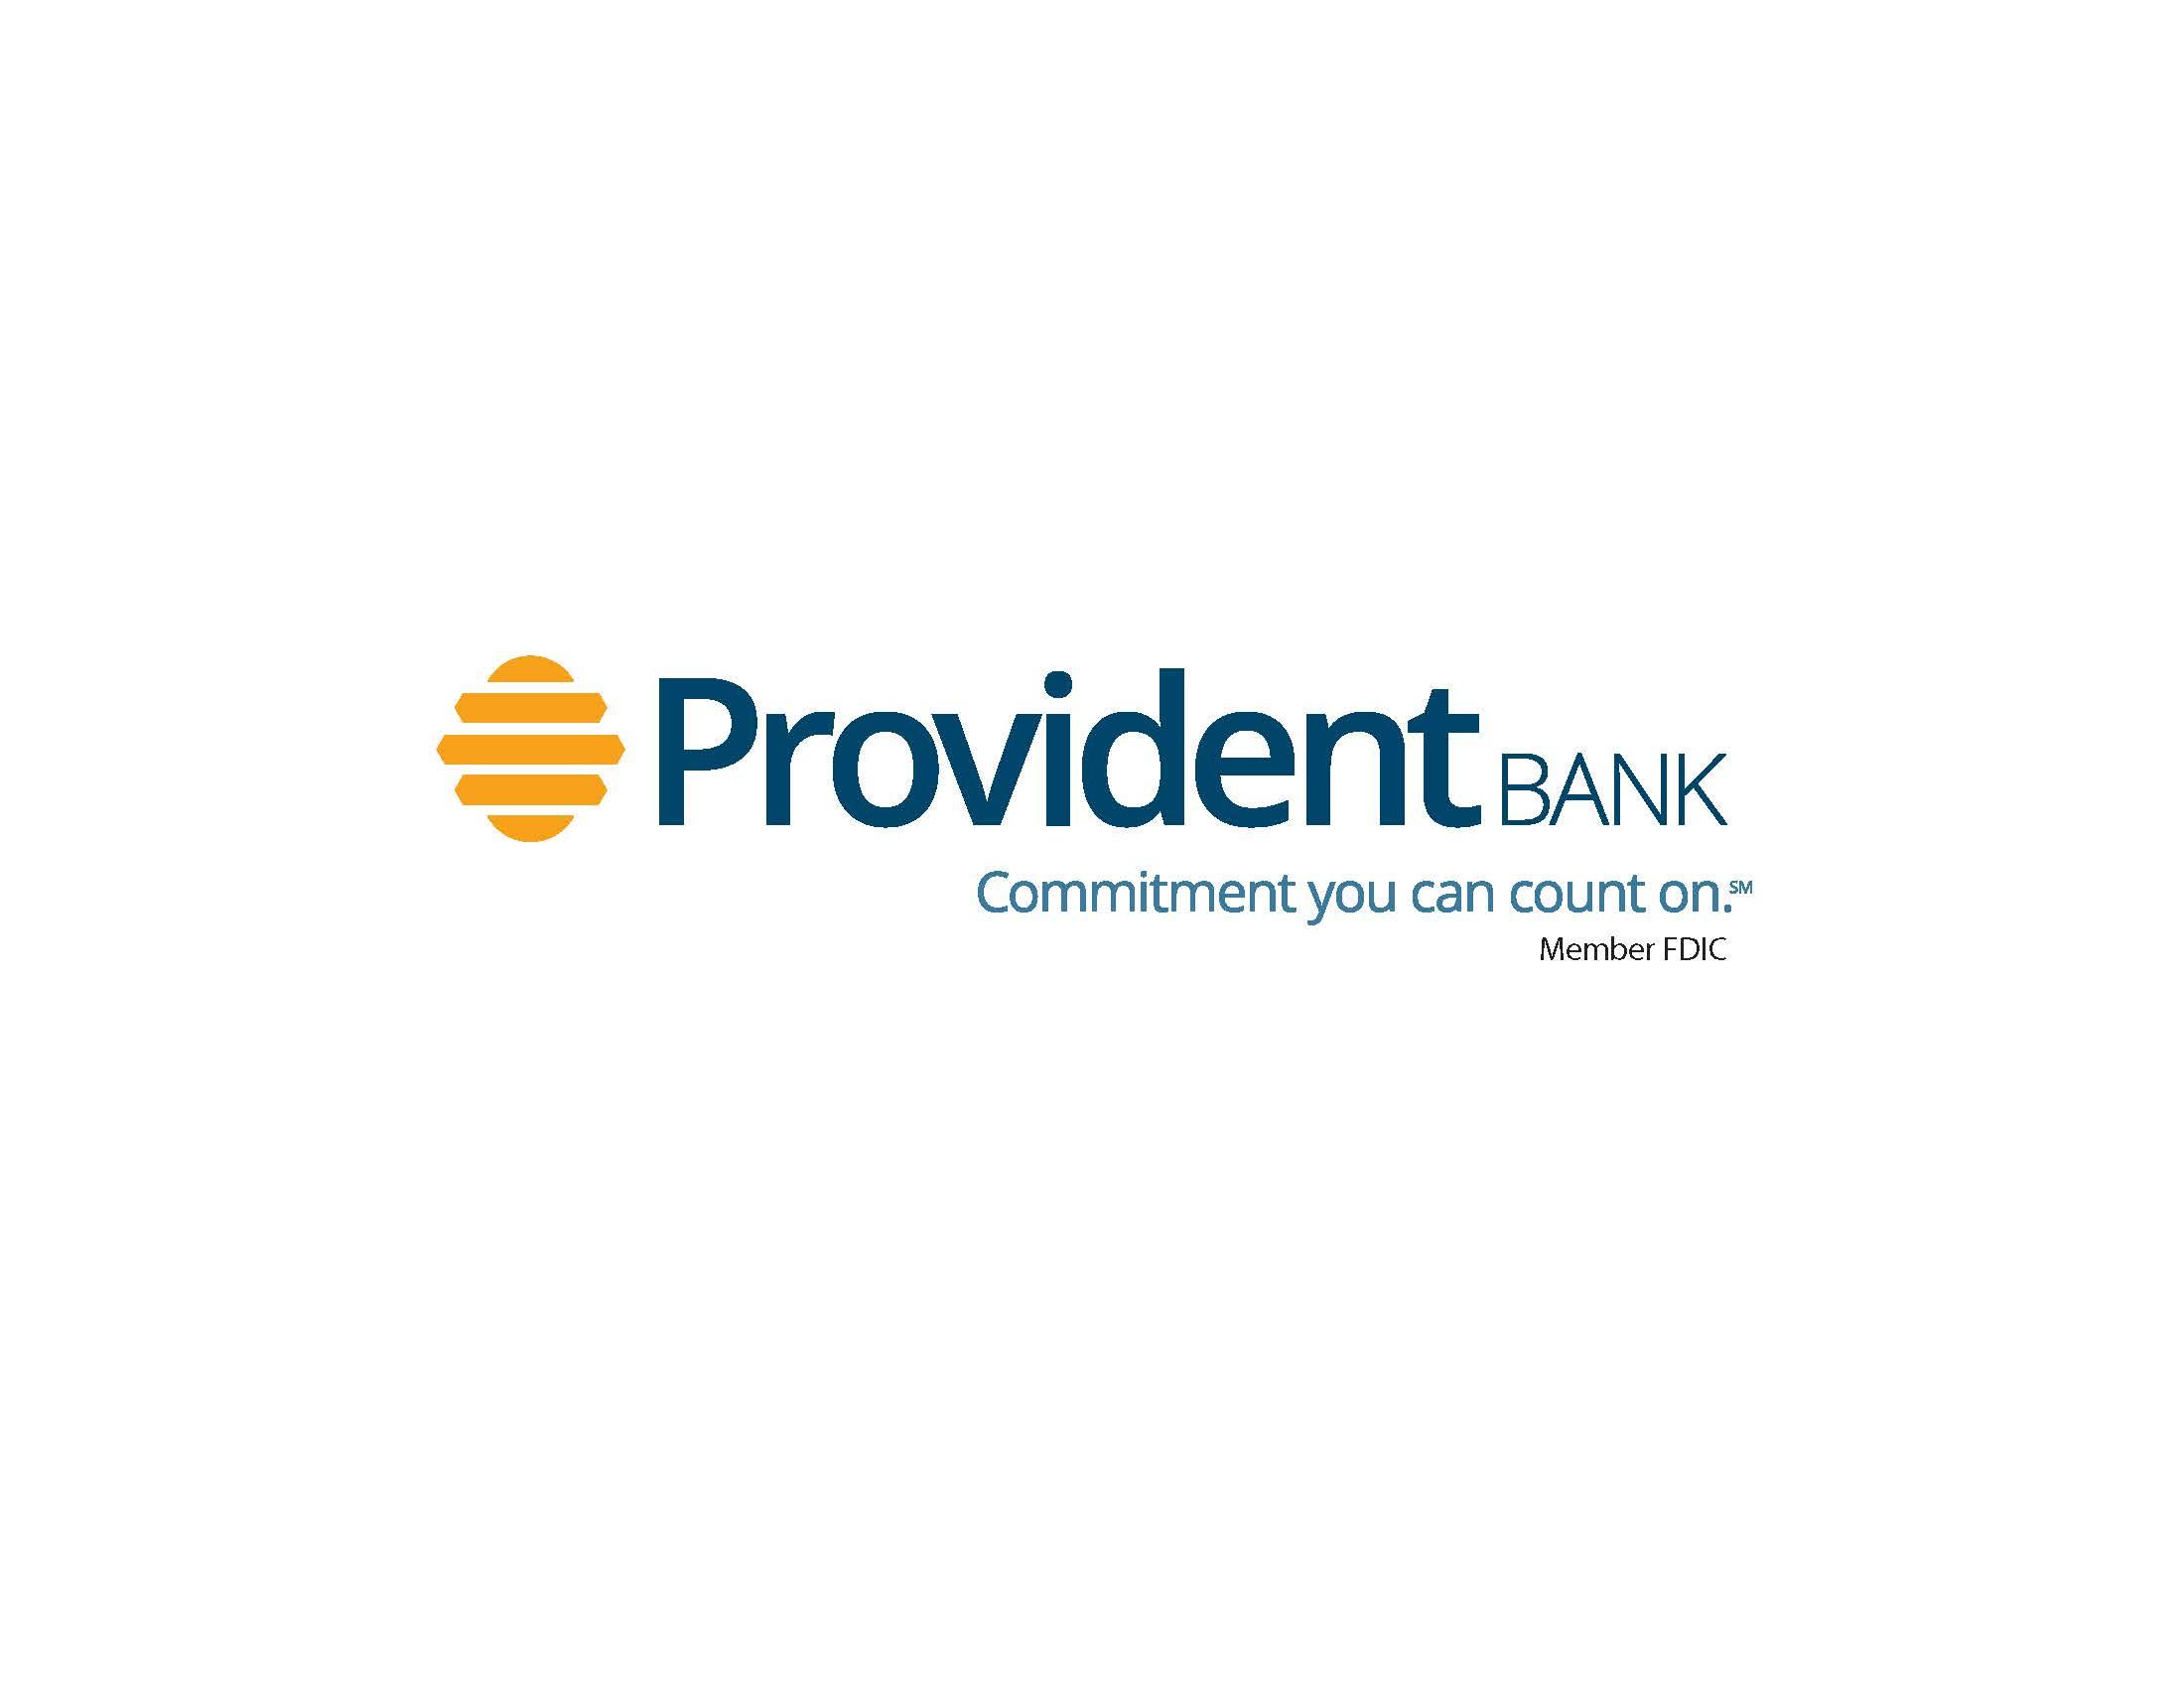 provident-bank-logo-2016